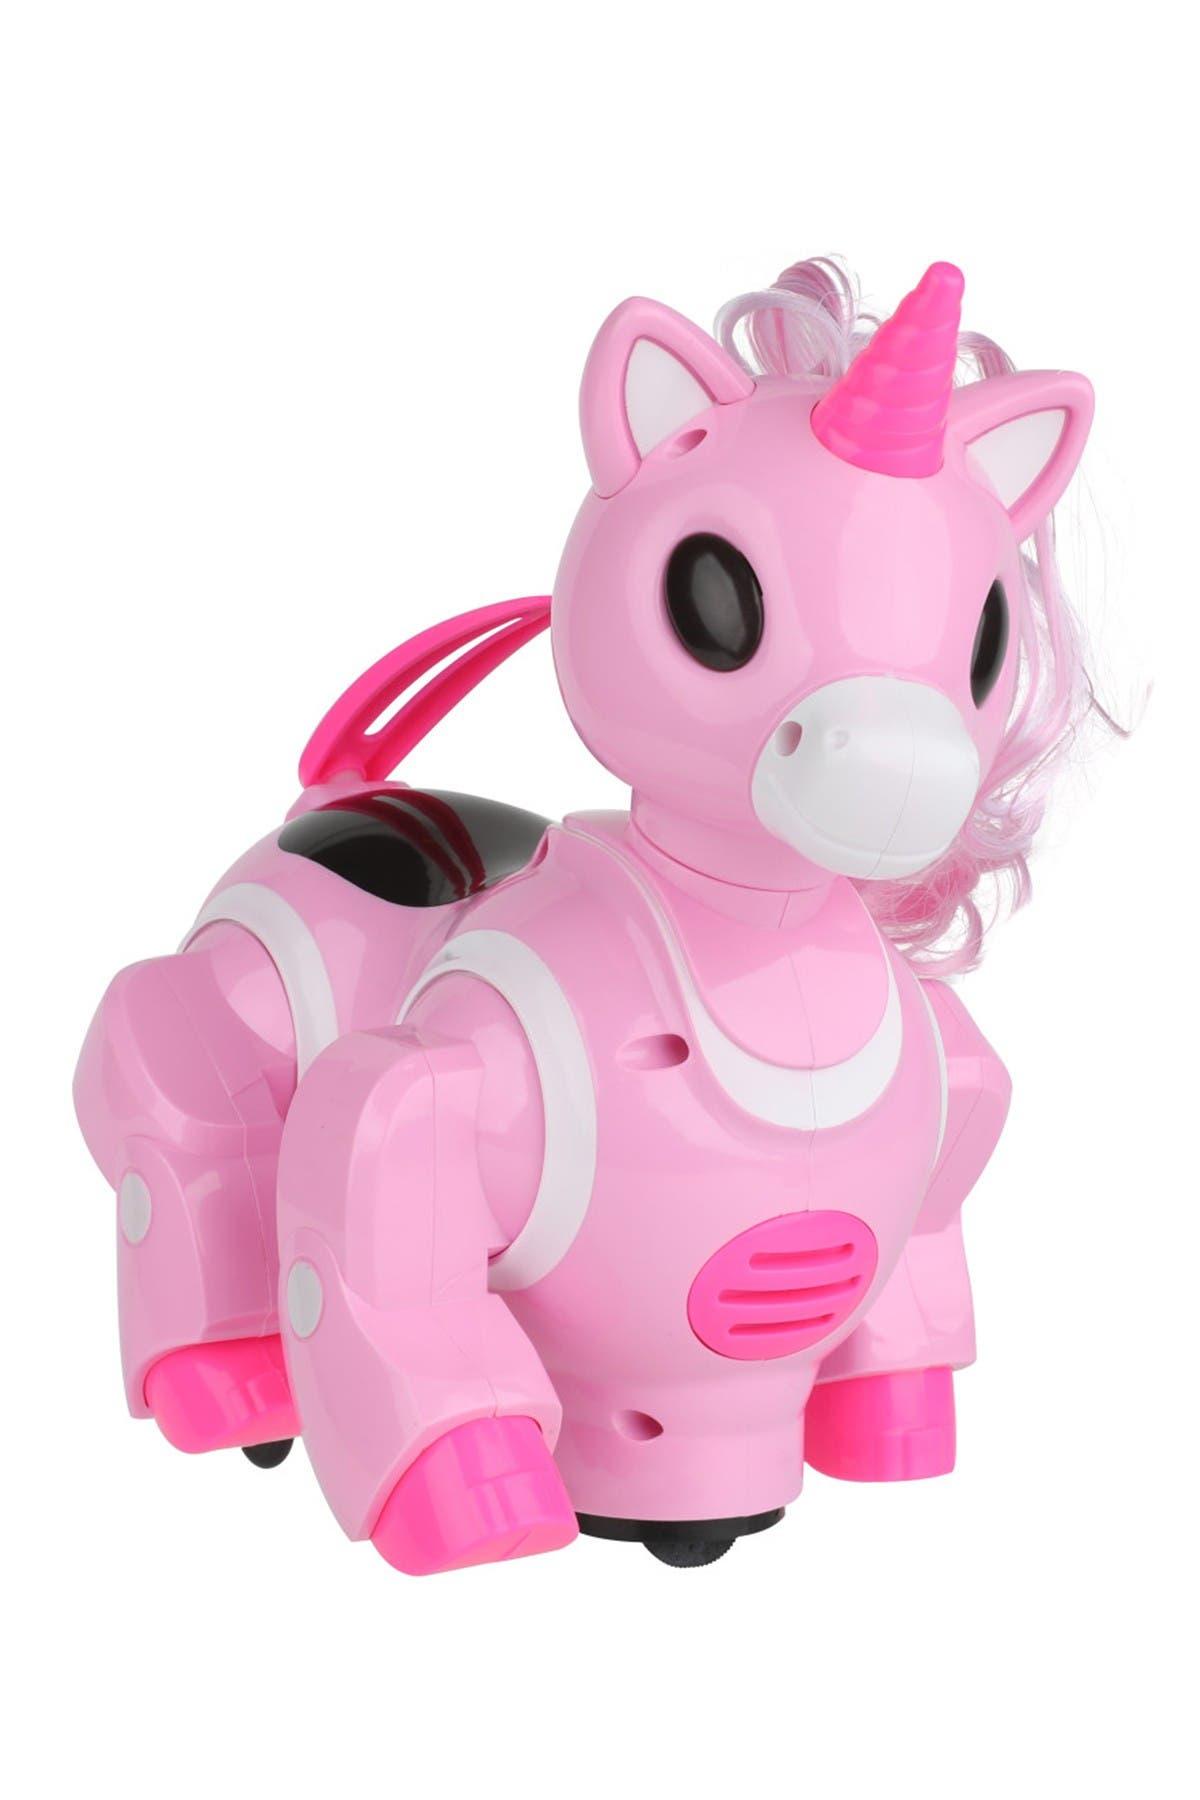 Image of VIVITAR Dancing Robot Unicorn